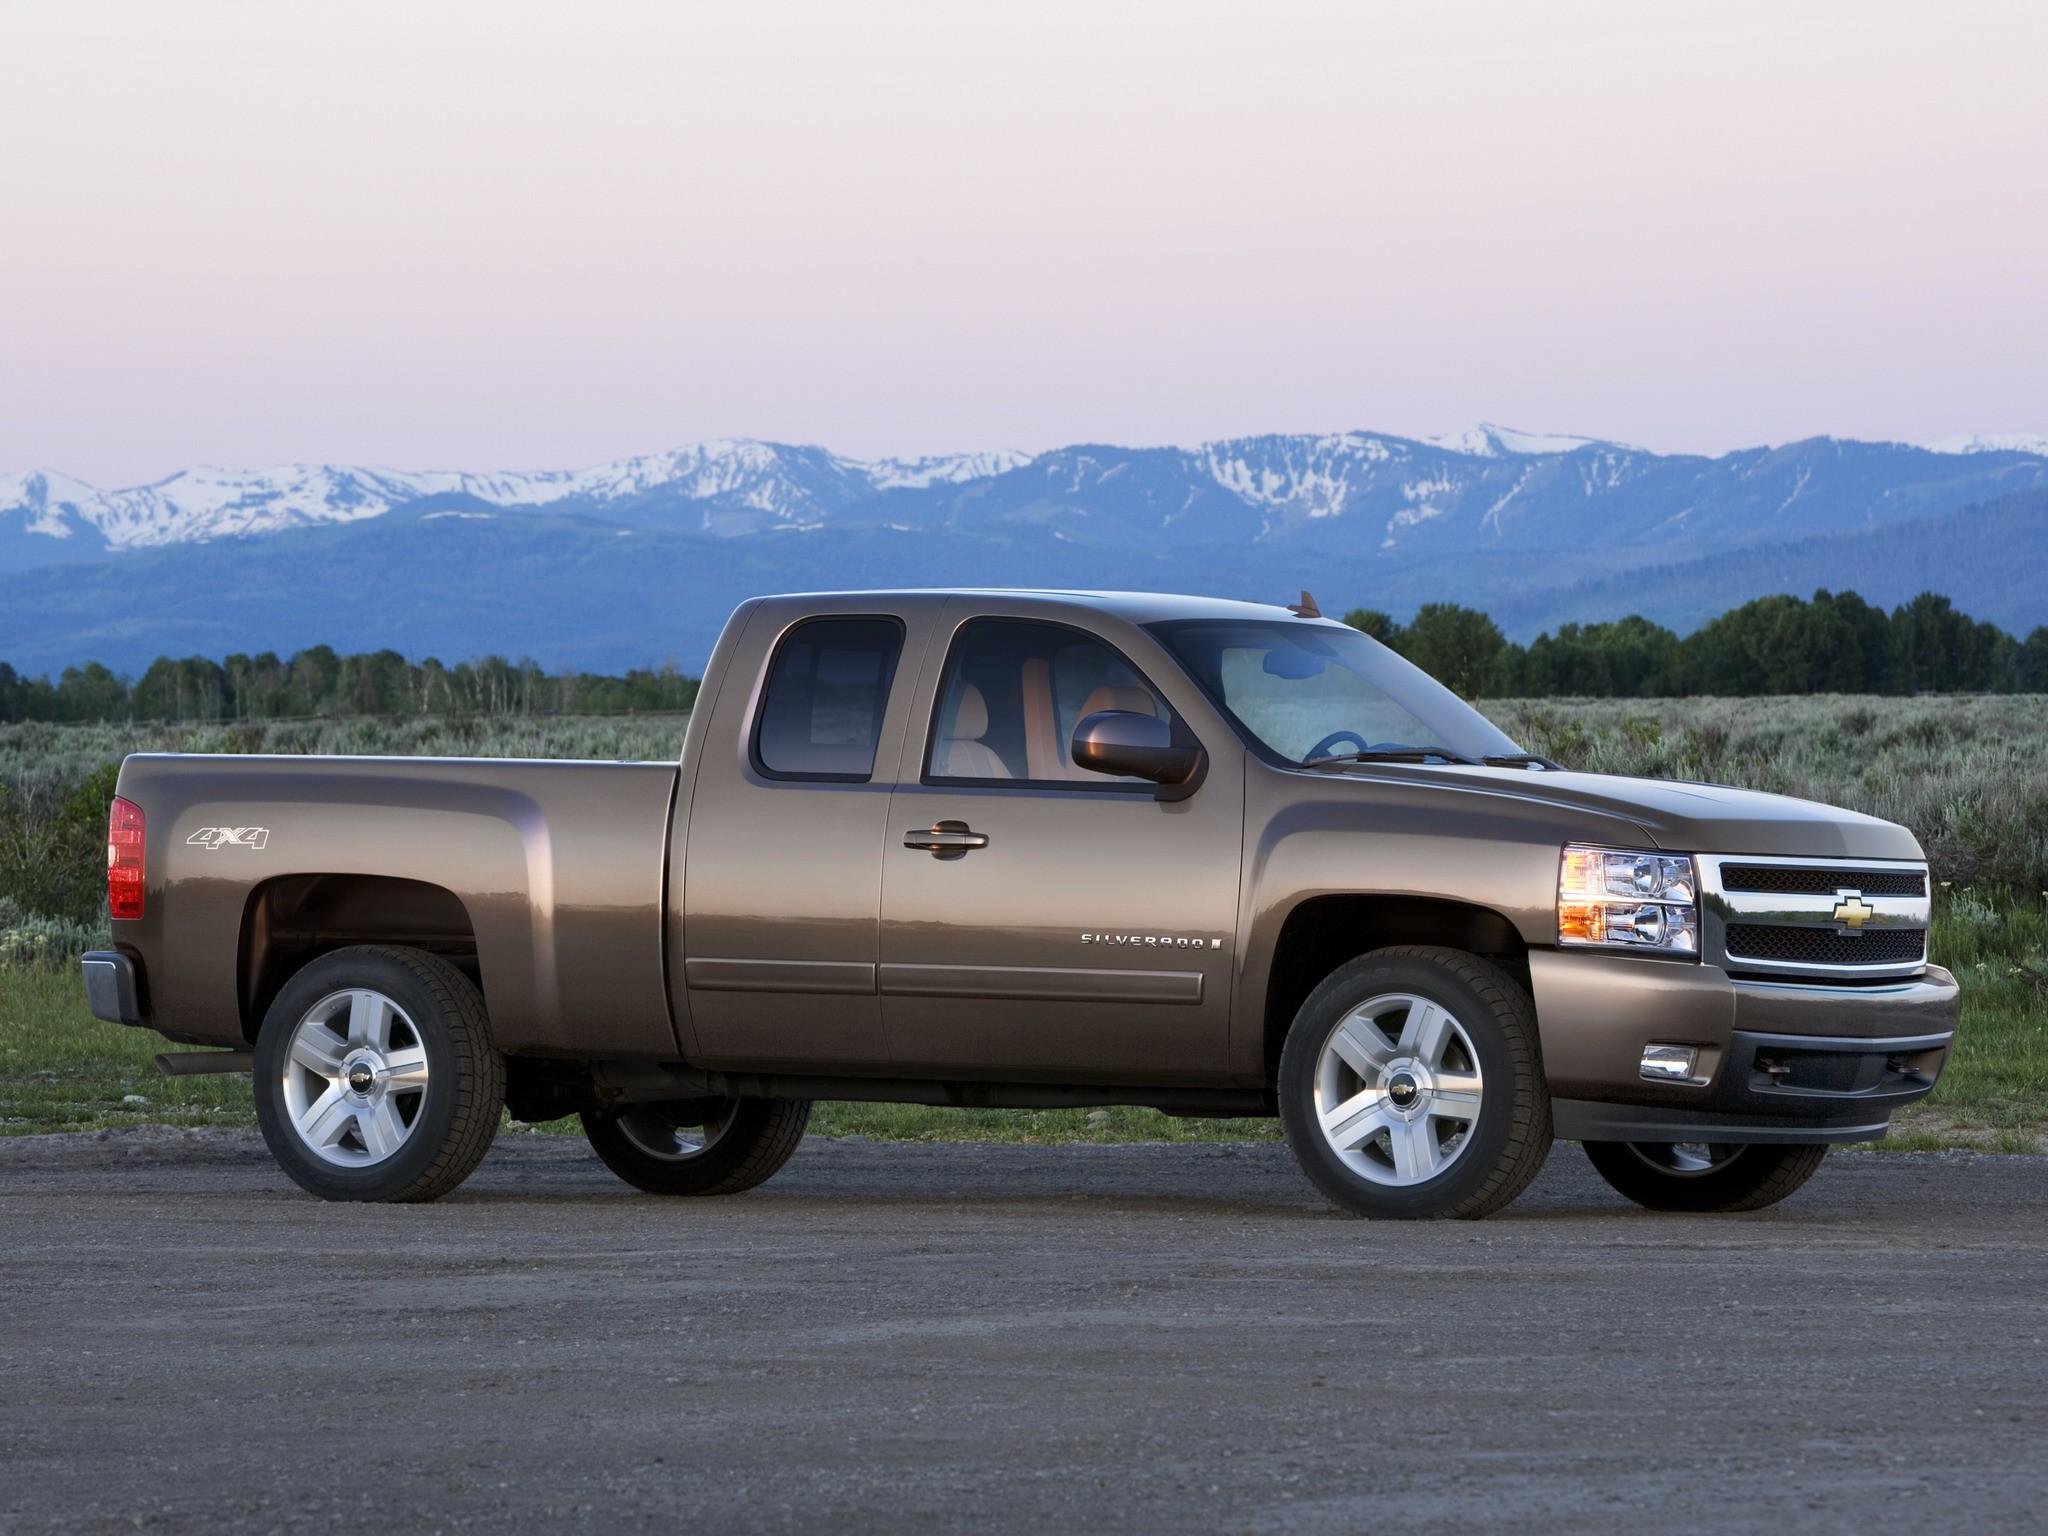 2007 Chevrolet Silverado 1500 Extended Cab >> CHEVROLET Silverado 1500 Extended Cab - 2008, 2009, 2010, 2011, 2012 - autoevolution